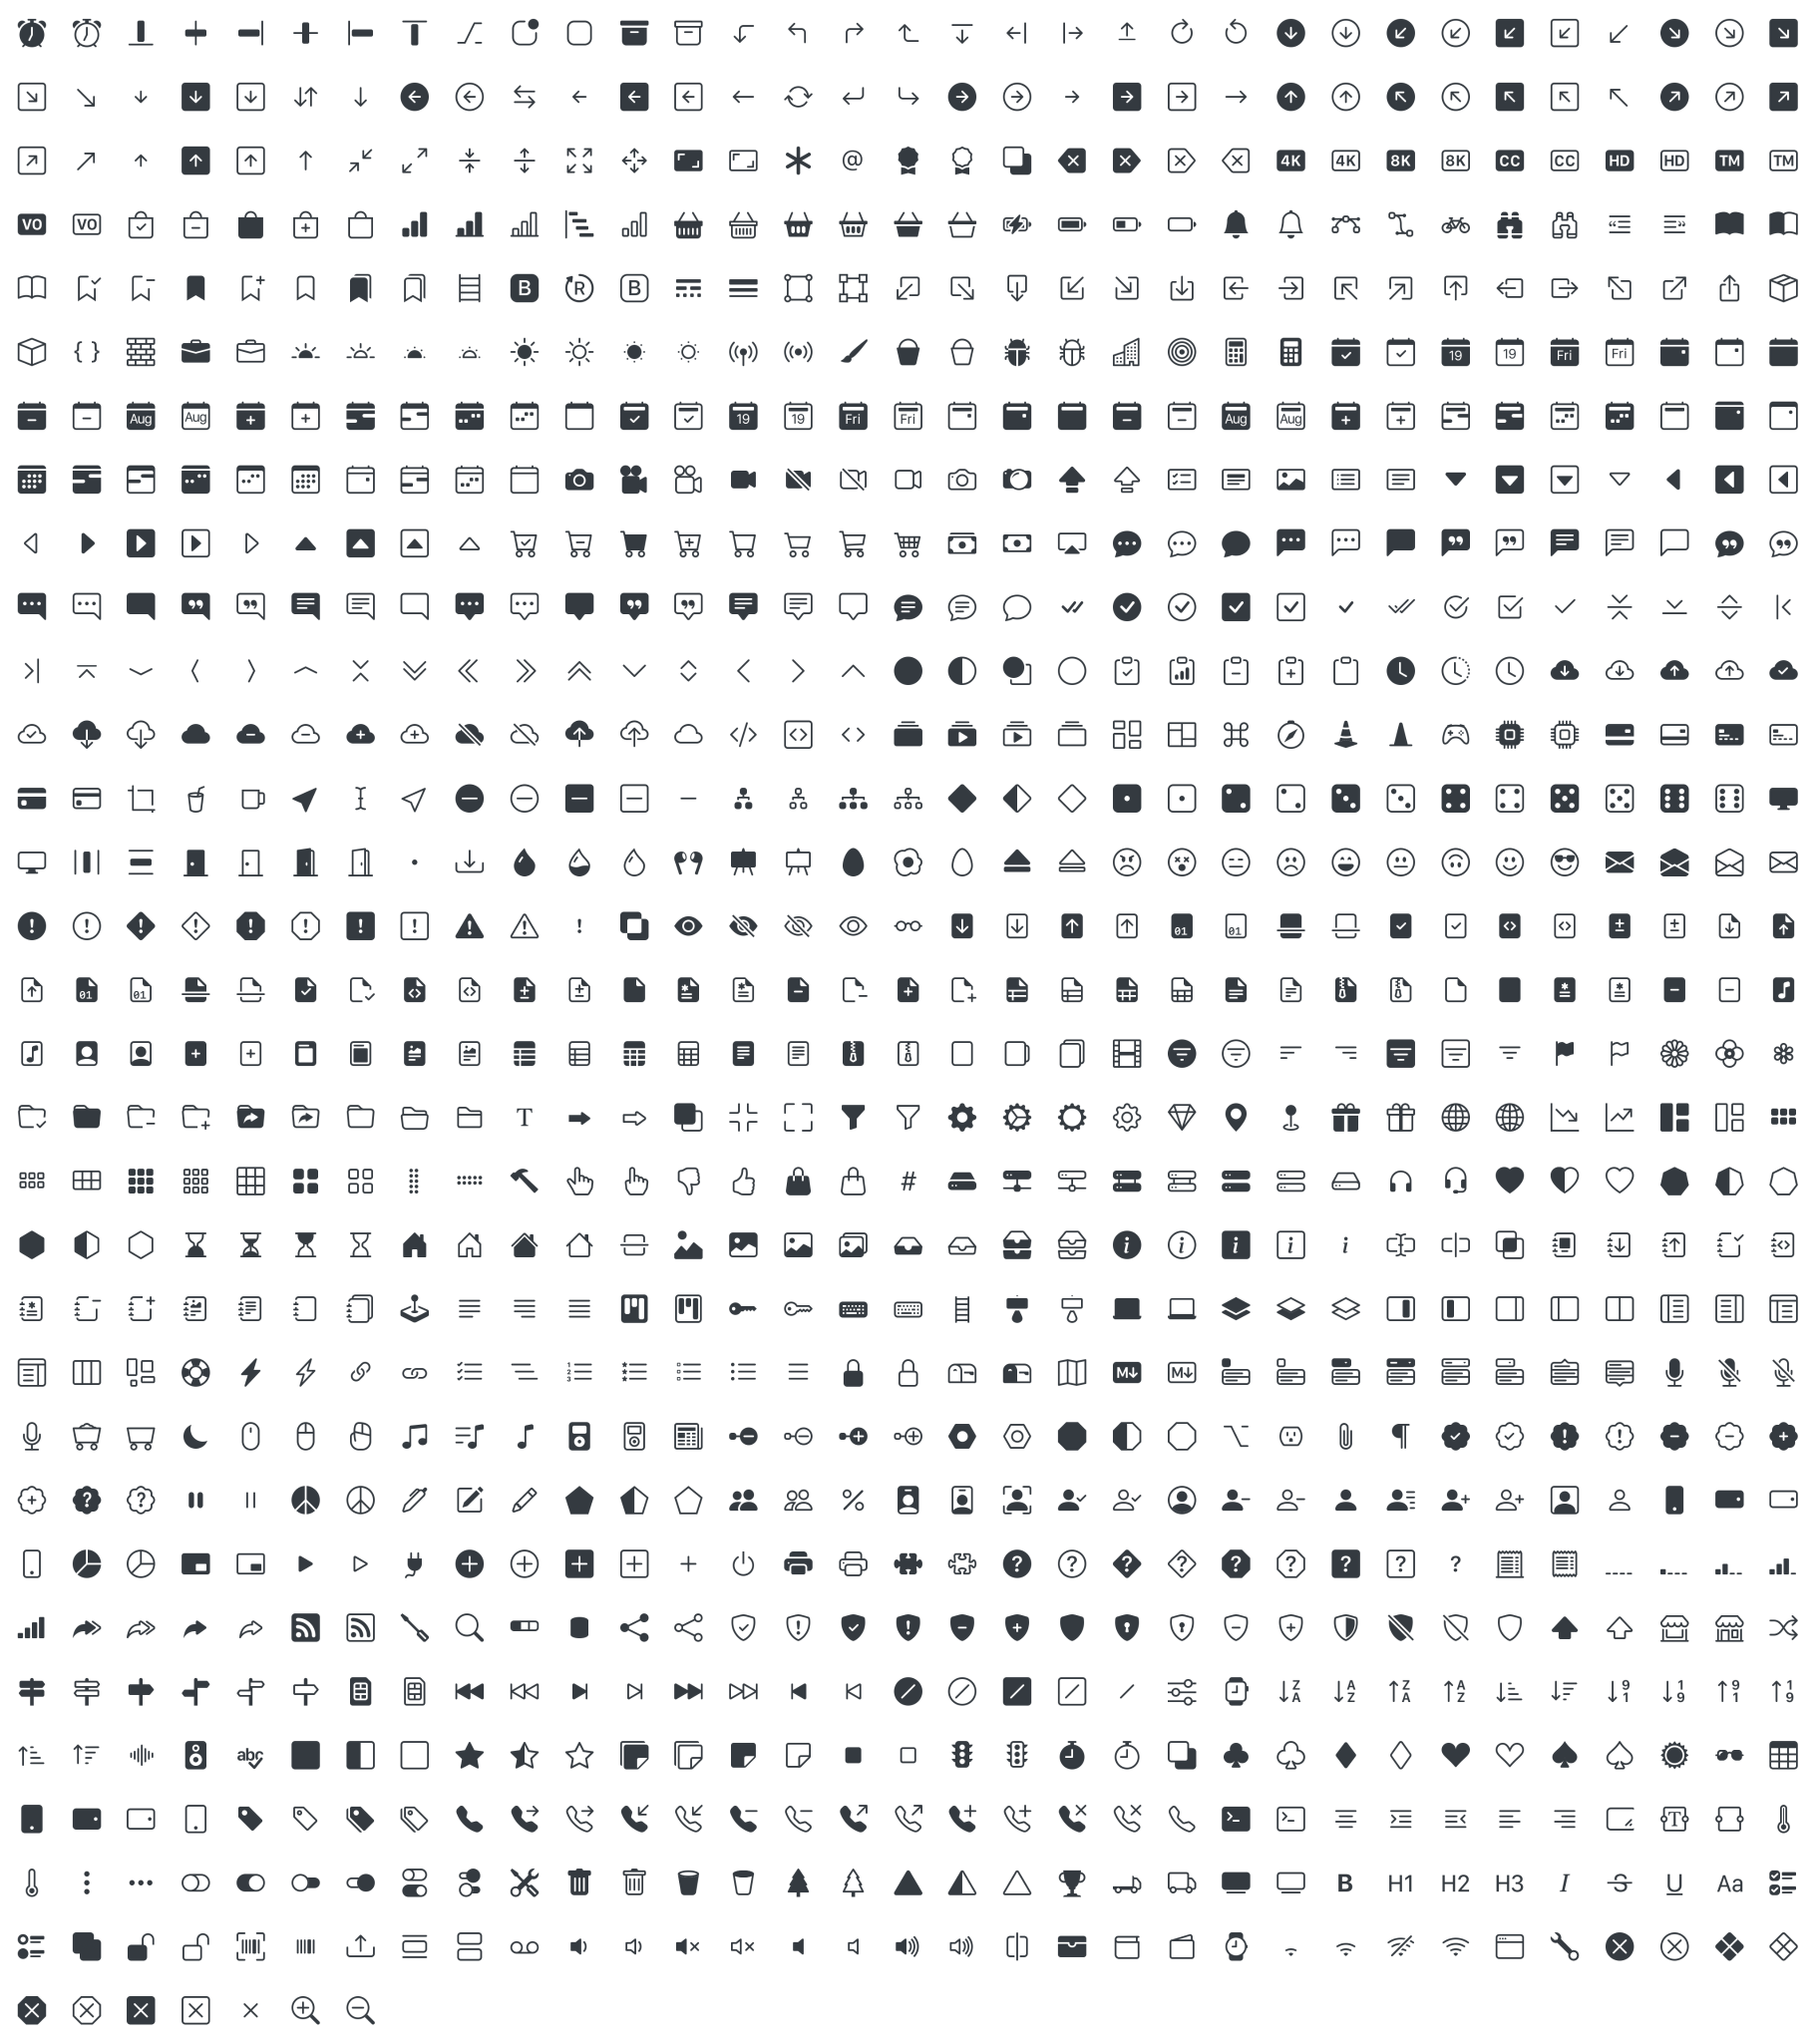 Bootstrap 官方开源 SVG 图标库 Bootstrap Icons